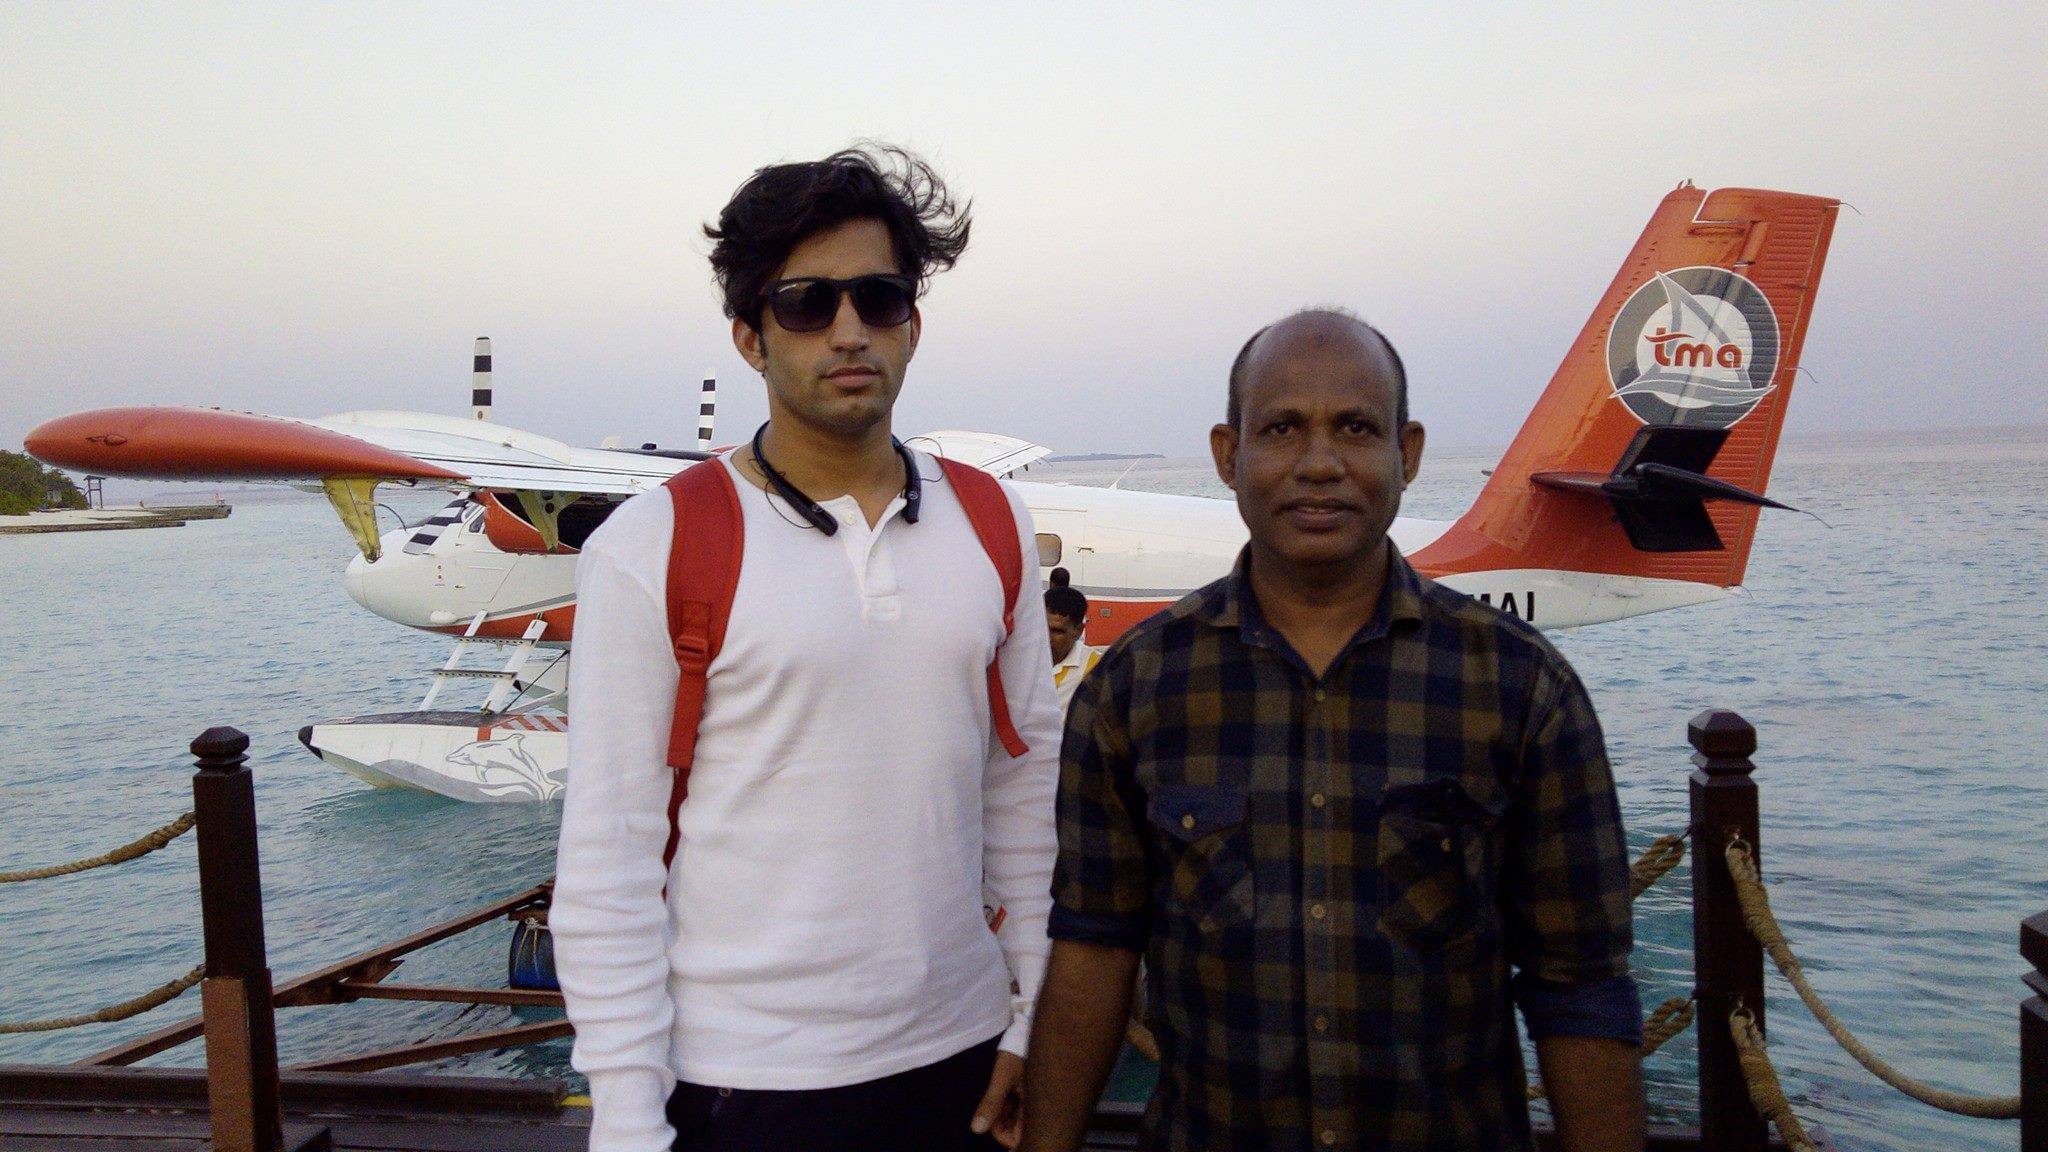 WAPDA's Abdul Basit signs for Maldivian club [Express Tribune]